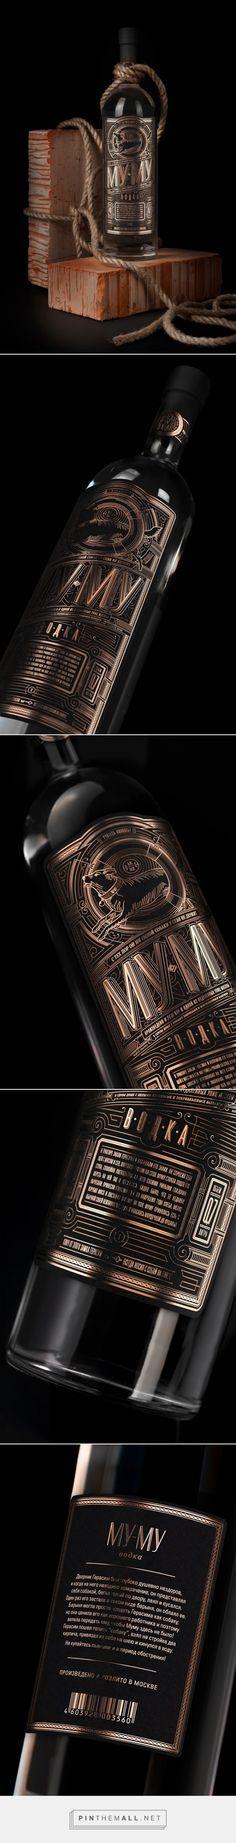 Mumu Vodka packaging concept designed by Denis Kalinin - http://www.packagingoftheworld.com/2015/09/mumu-vodka-concept.html